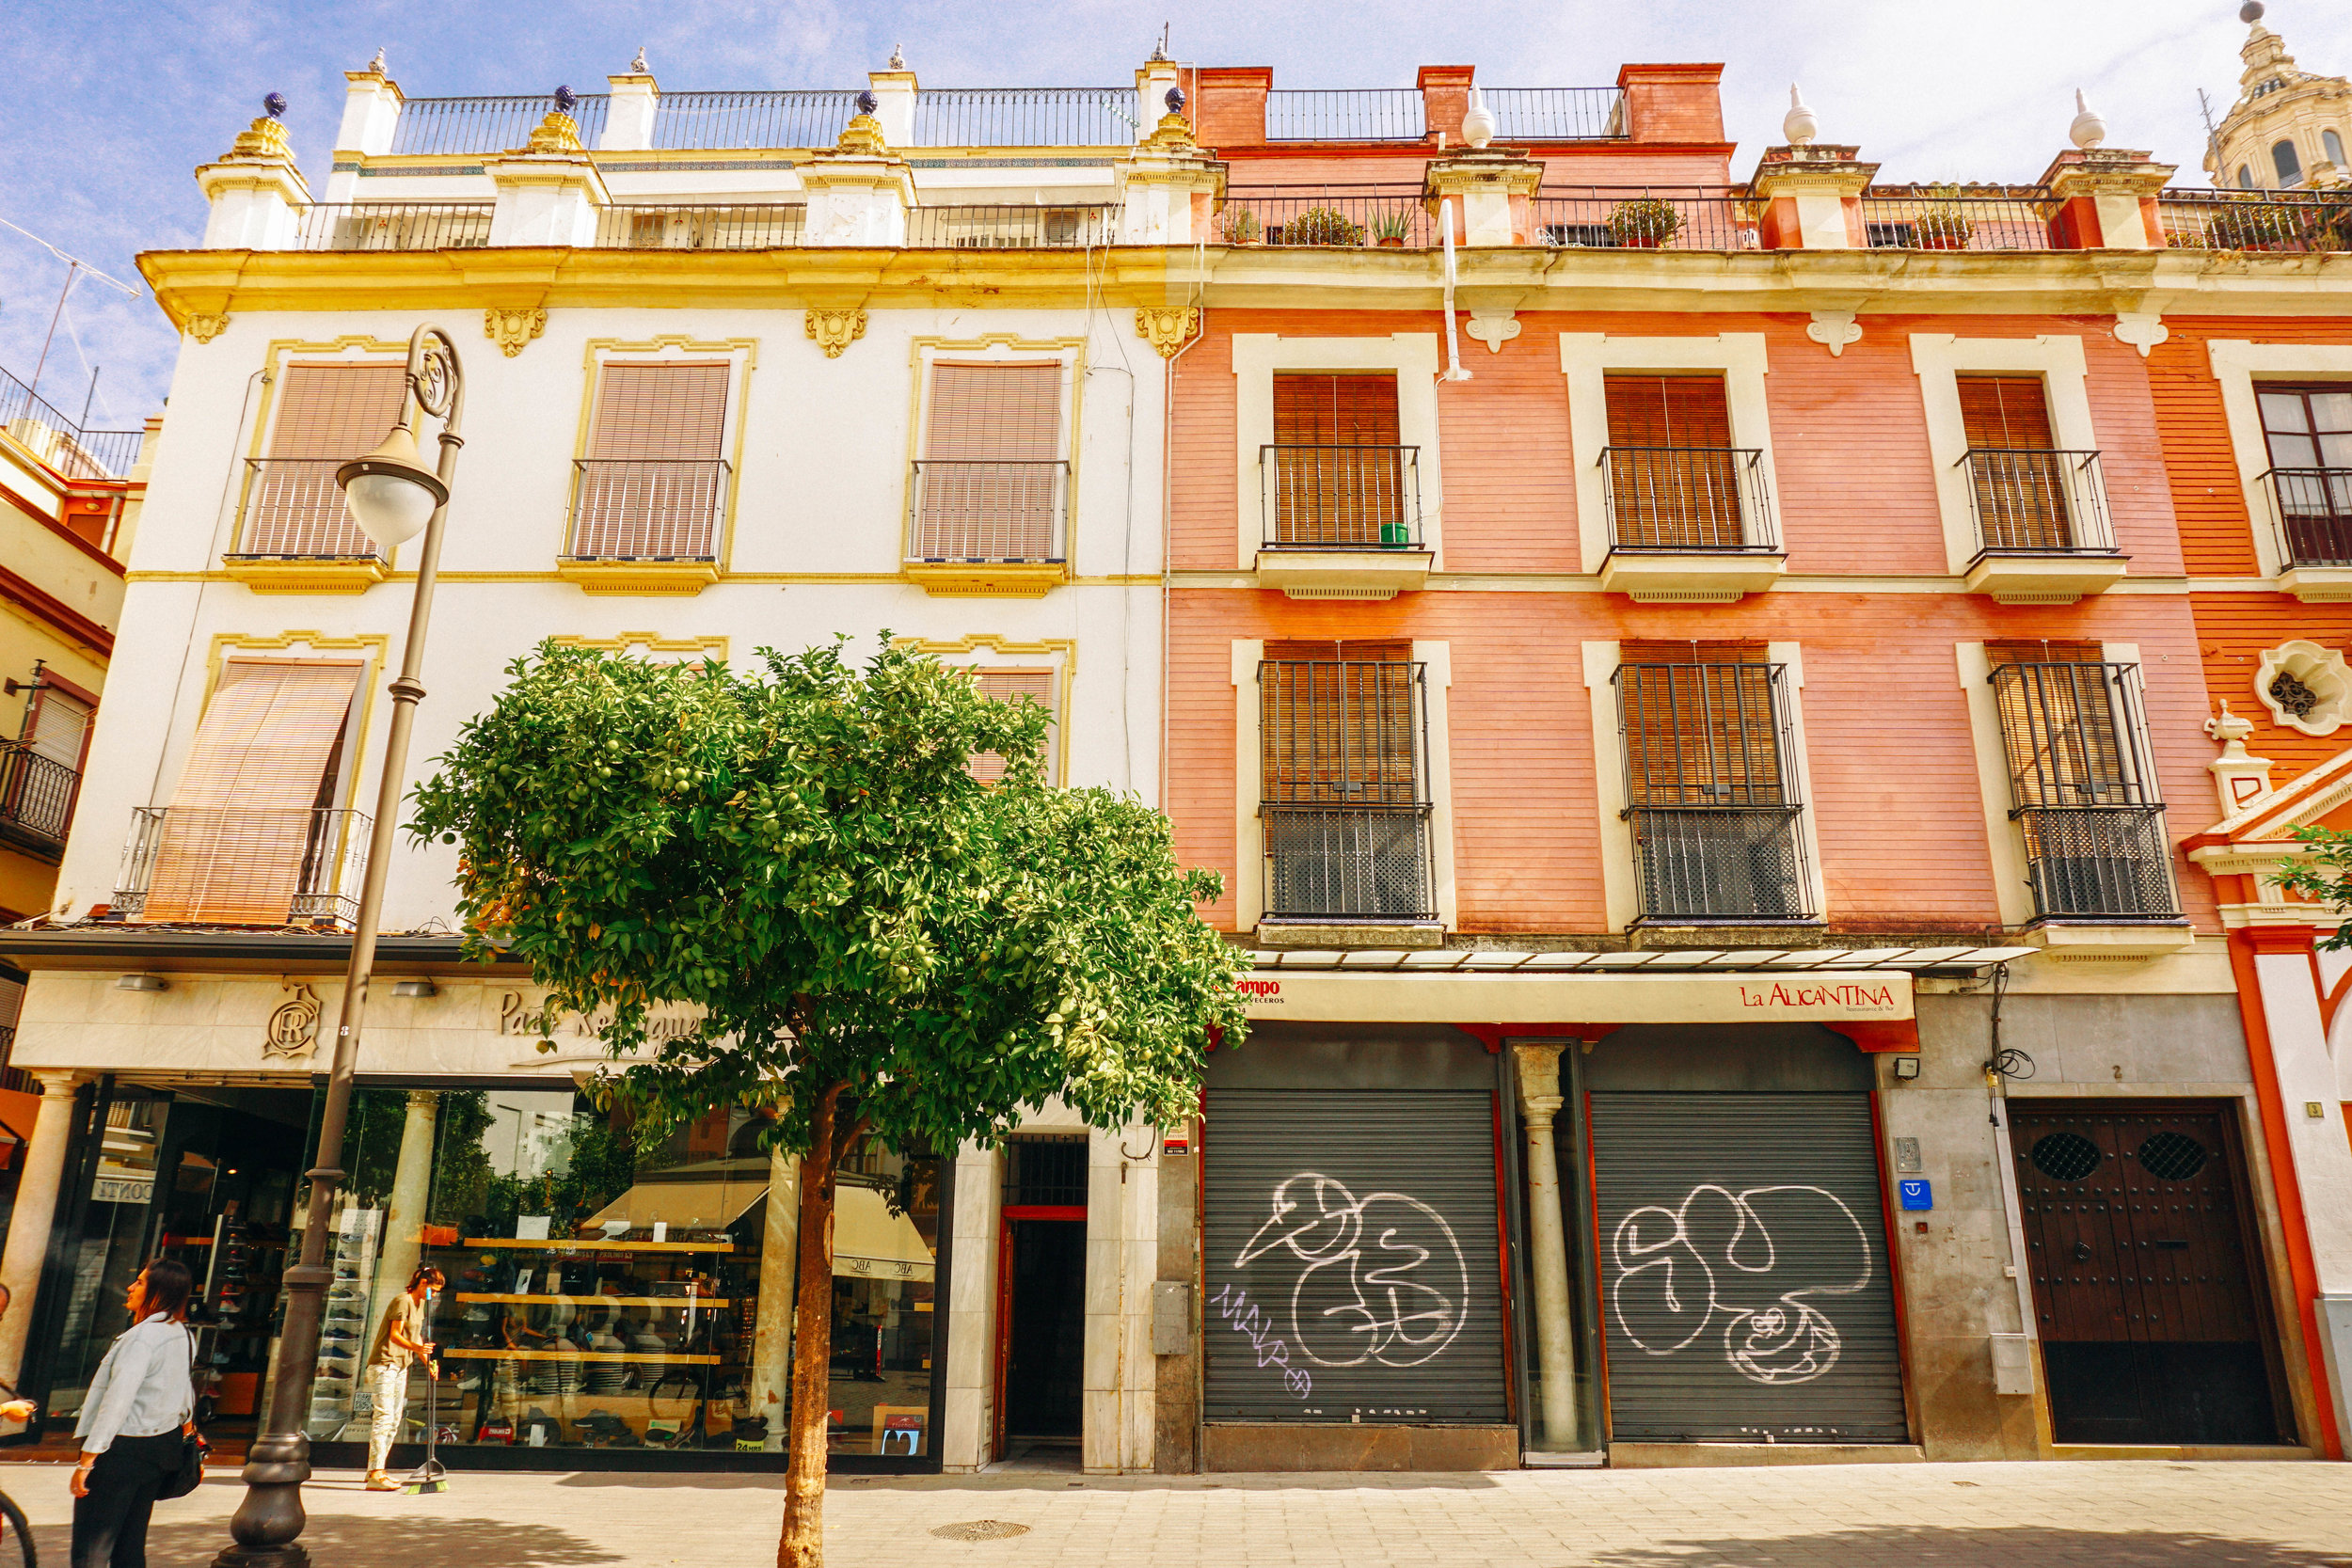 Barrio de Santa Cruz, Seville, Spain. Travel Guide to Seville.